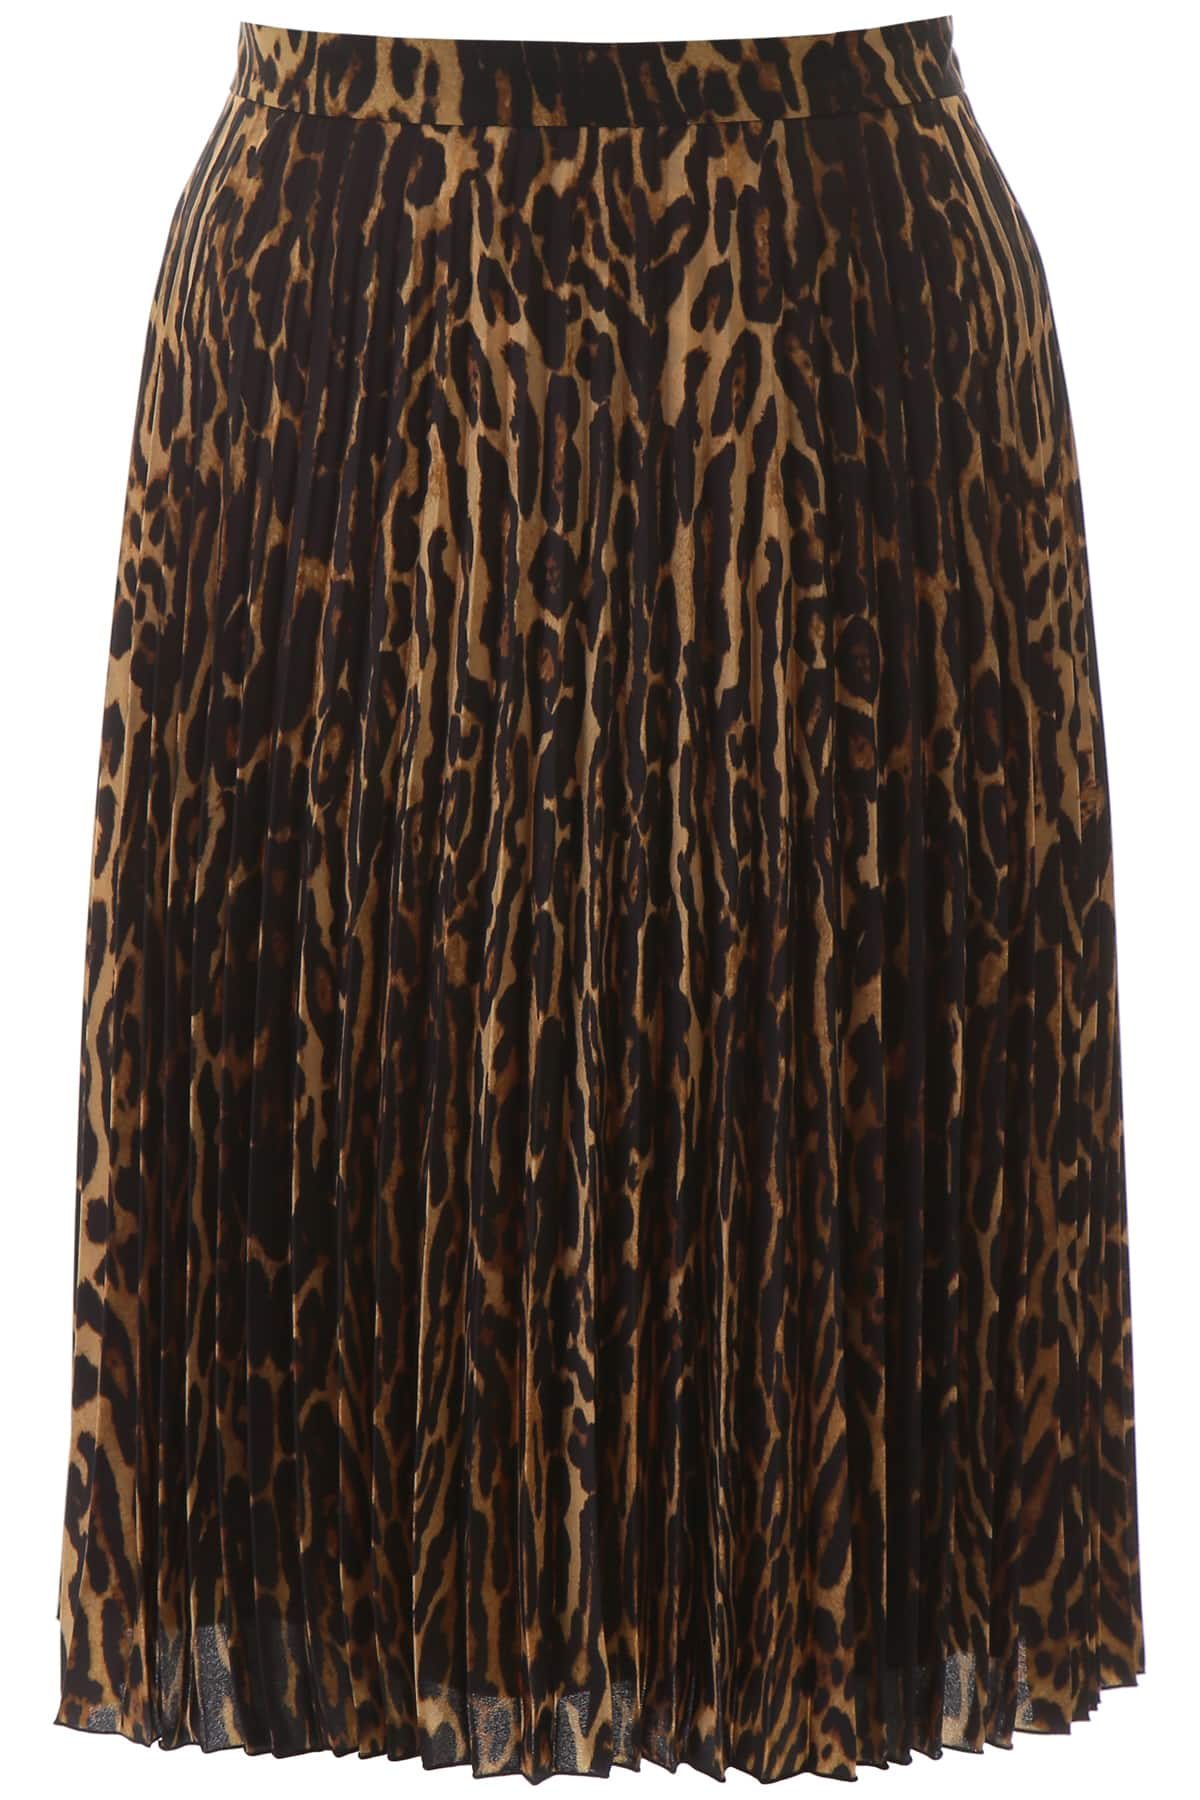 BURBERRY PLEATED ANIMALIER SKIRT 10 Brown, Black